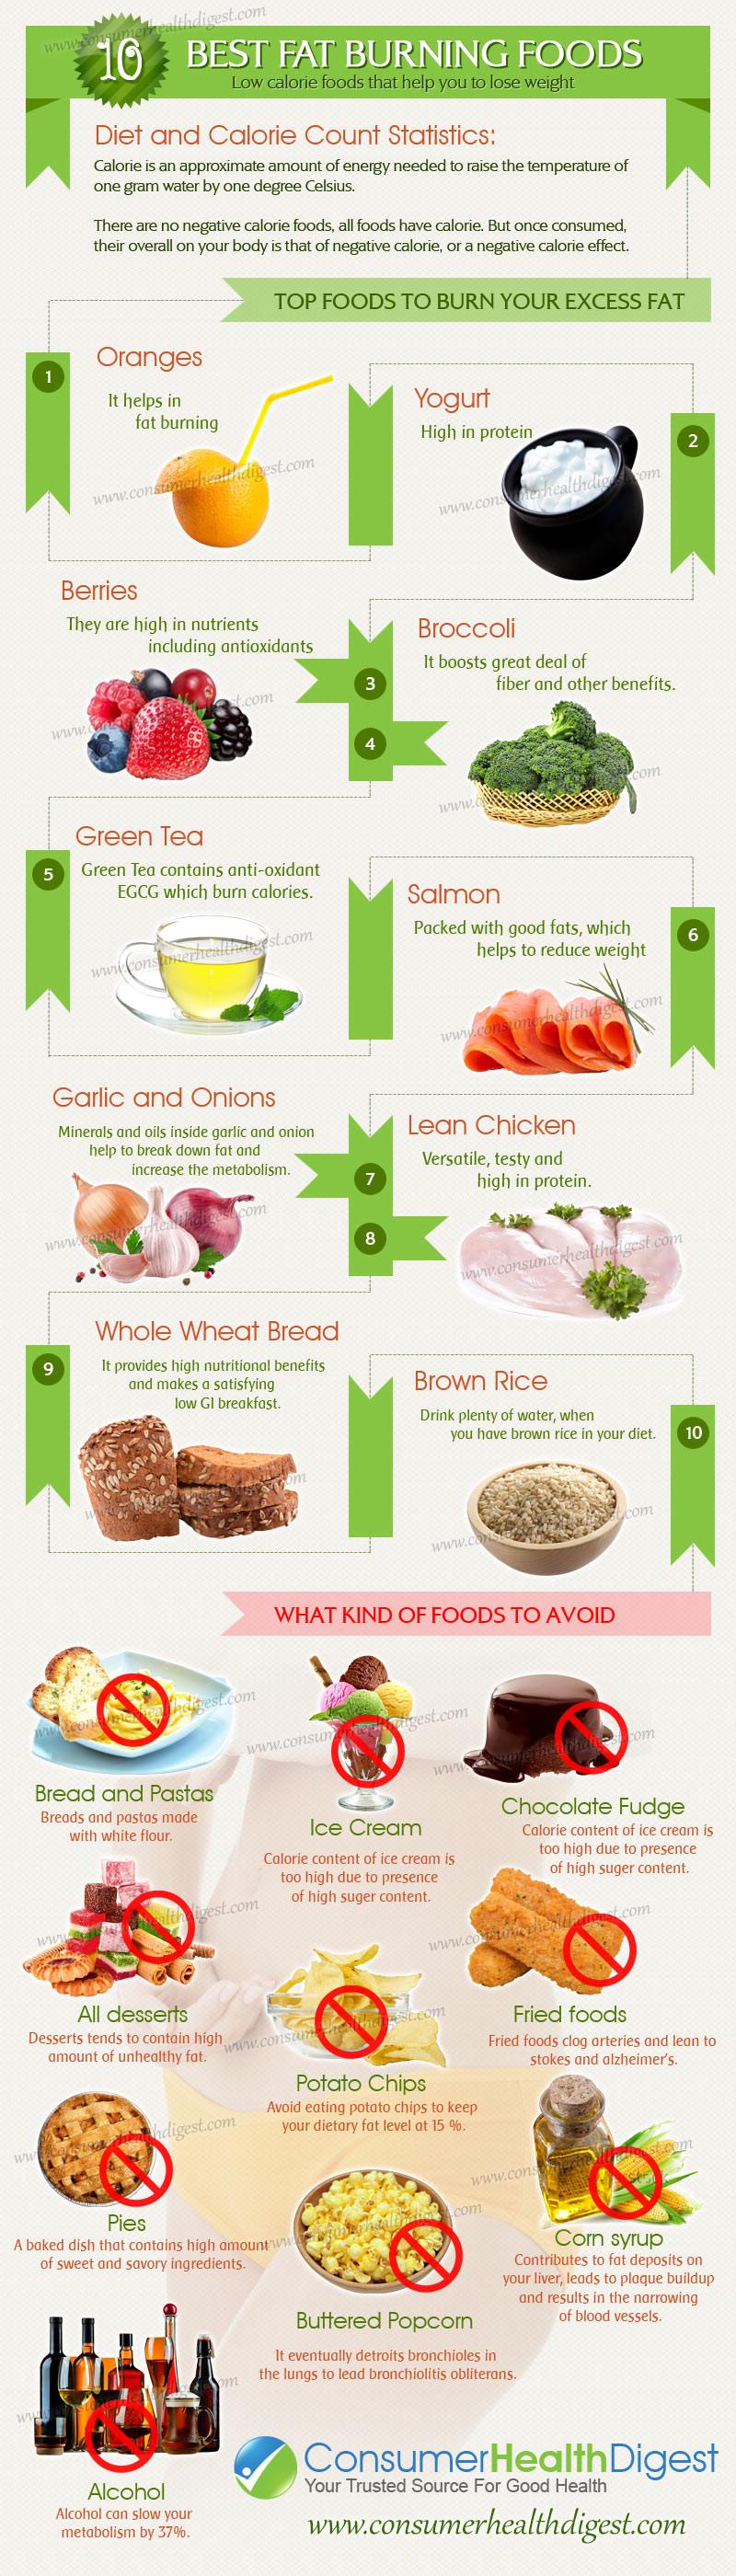 Healthy Fat Burning Snacks  10 Best Fat Burning Foods